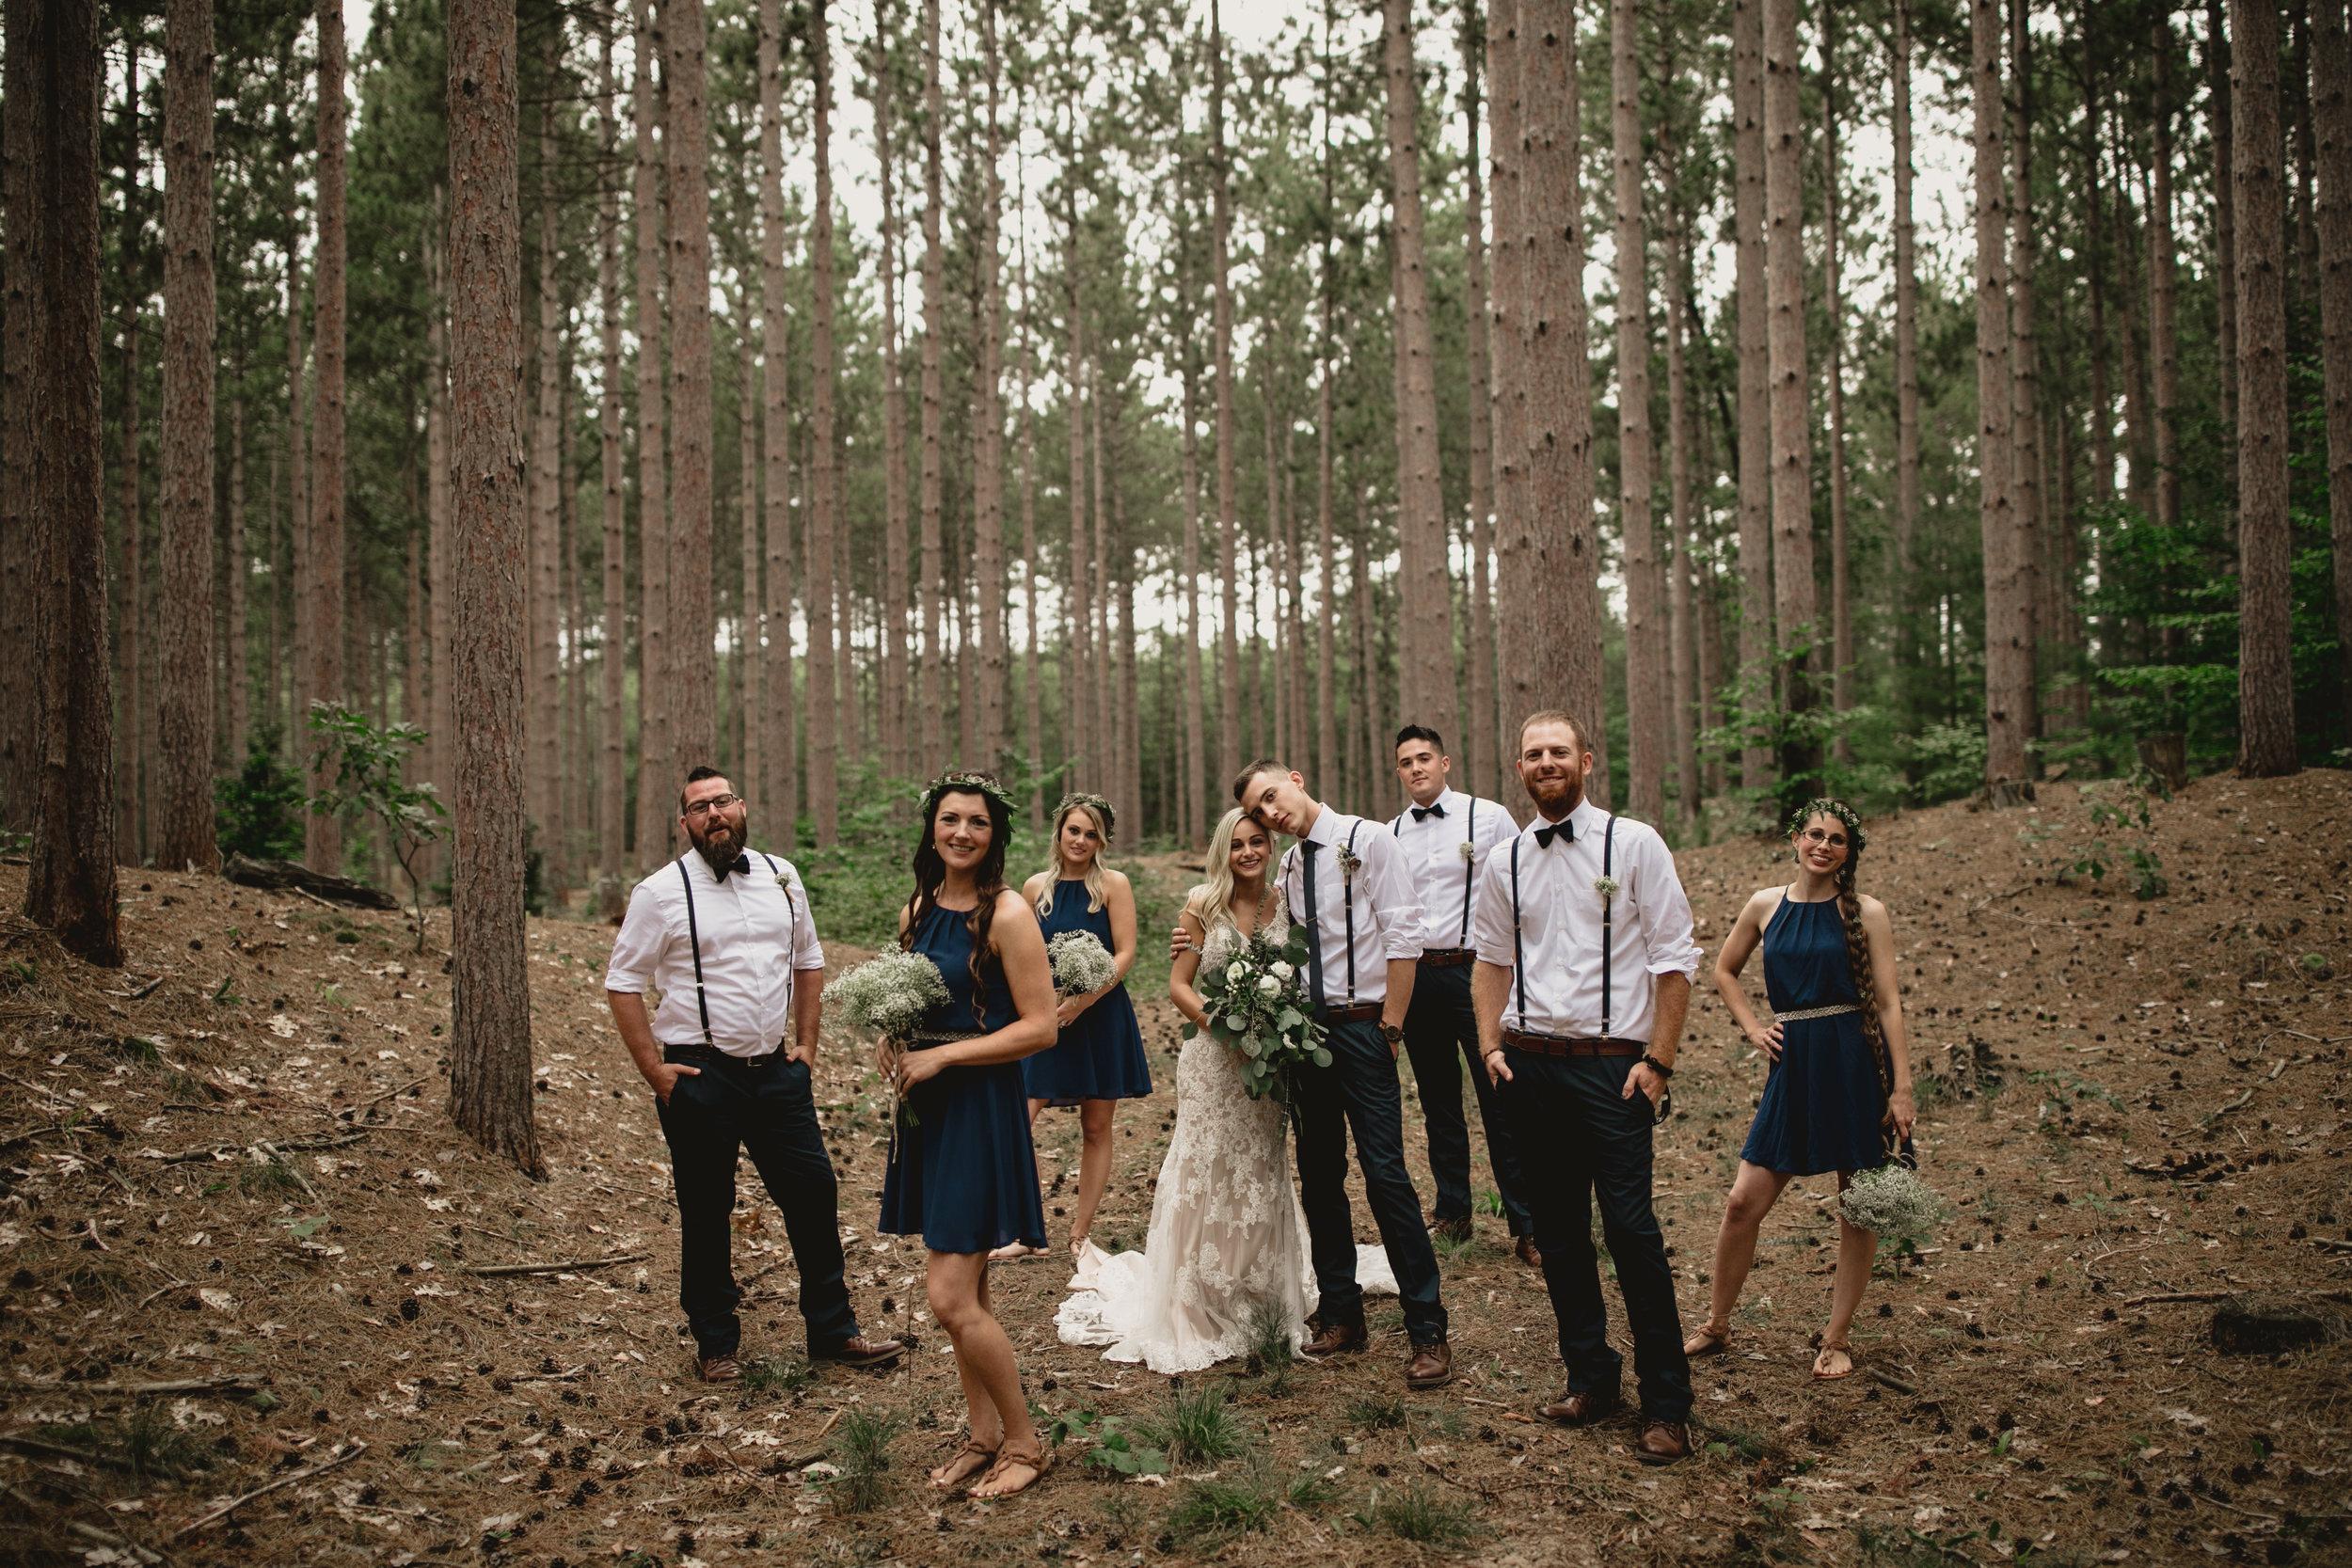 west-michigan-wedding-photographer-whitehall-rachel-austin-chapel-in-the-pines-474.jpg